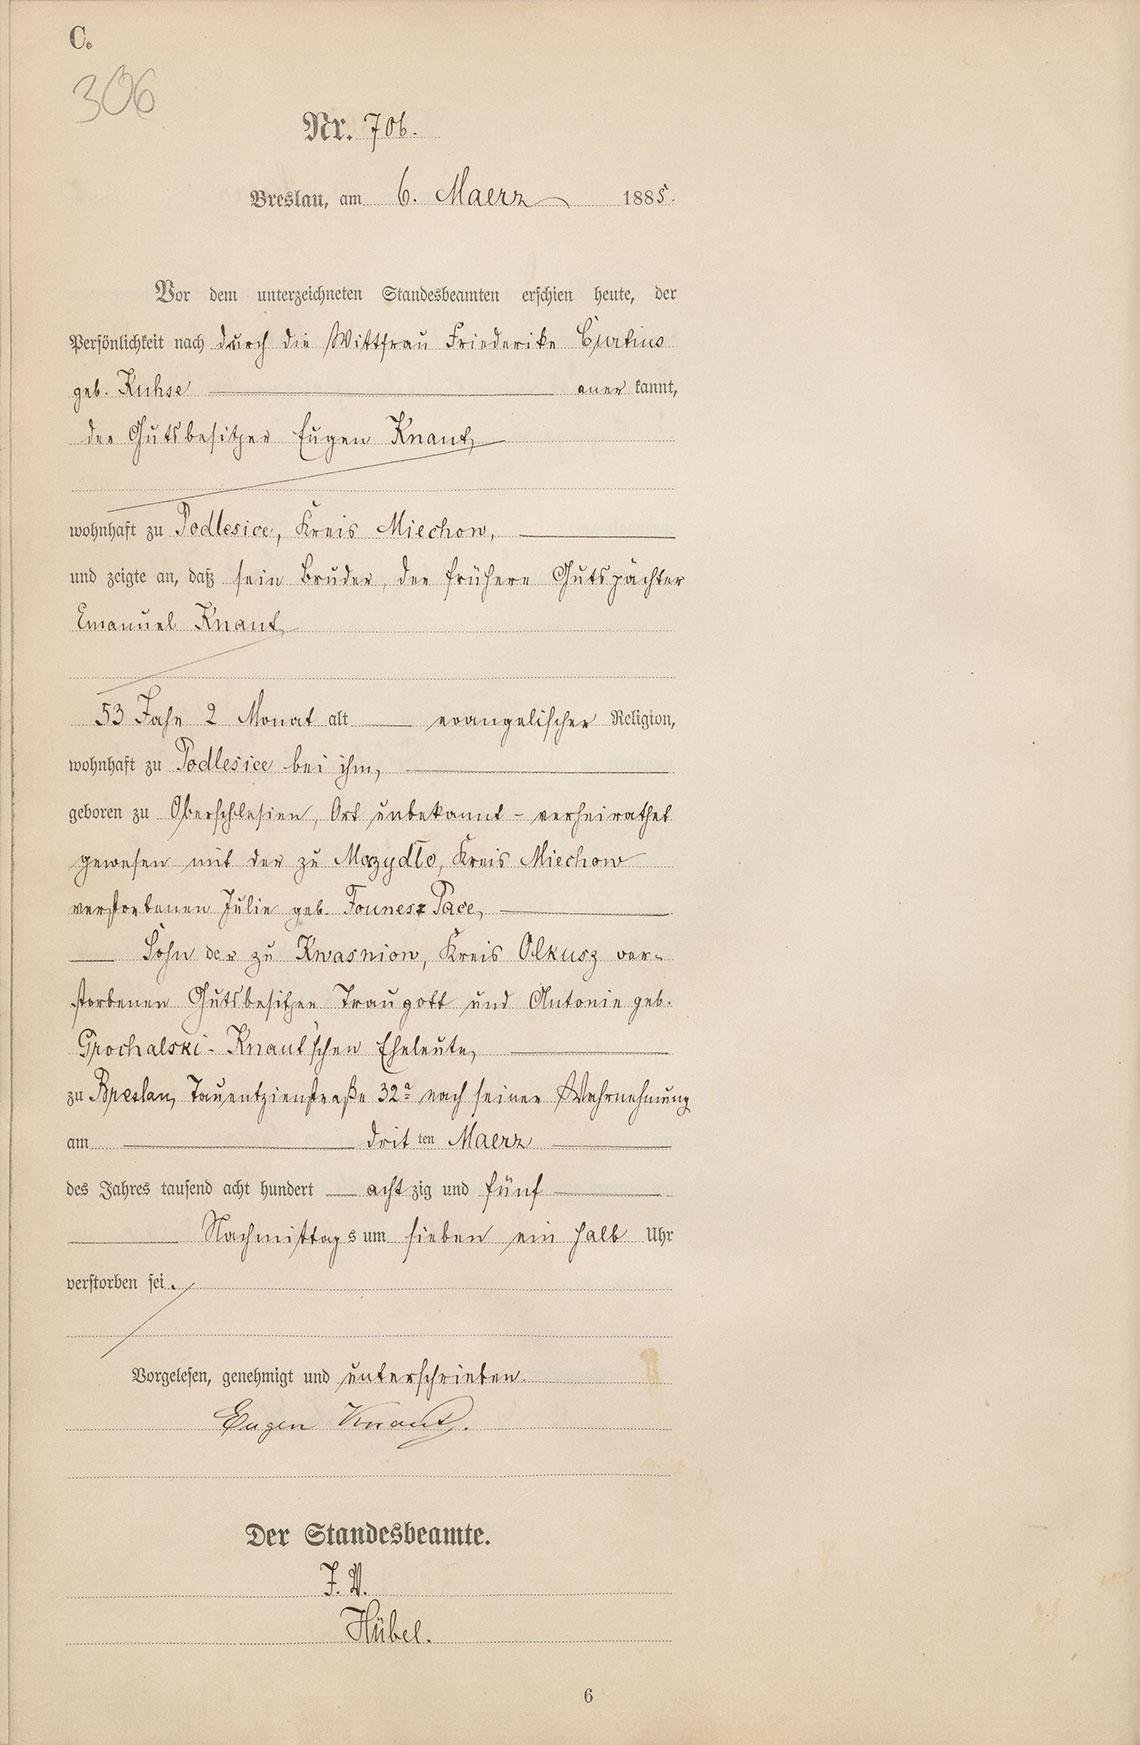 Akt USC zgonu Emanuel Knaut 03.03.1885 r.